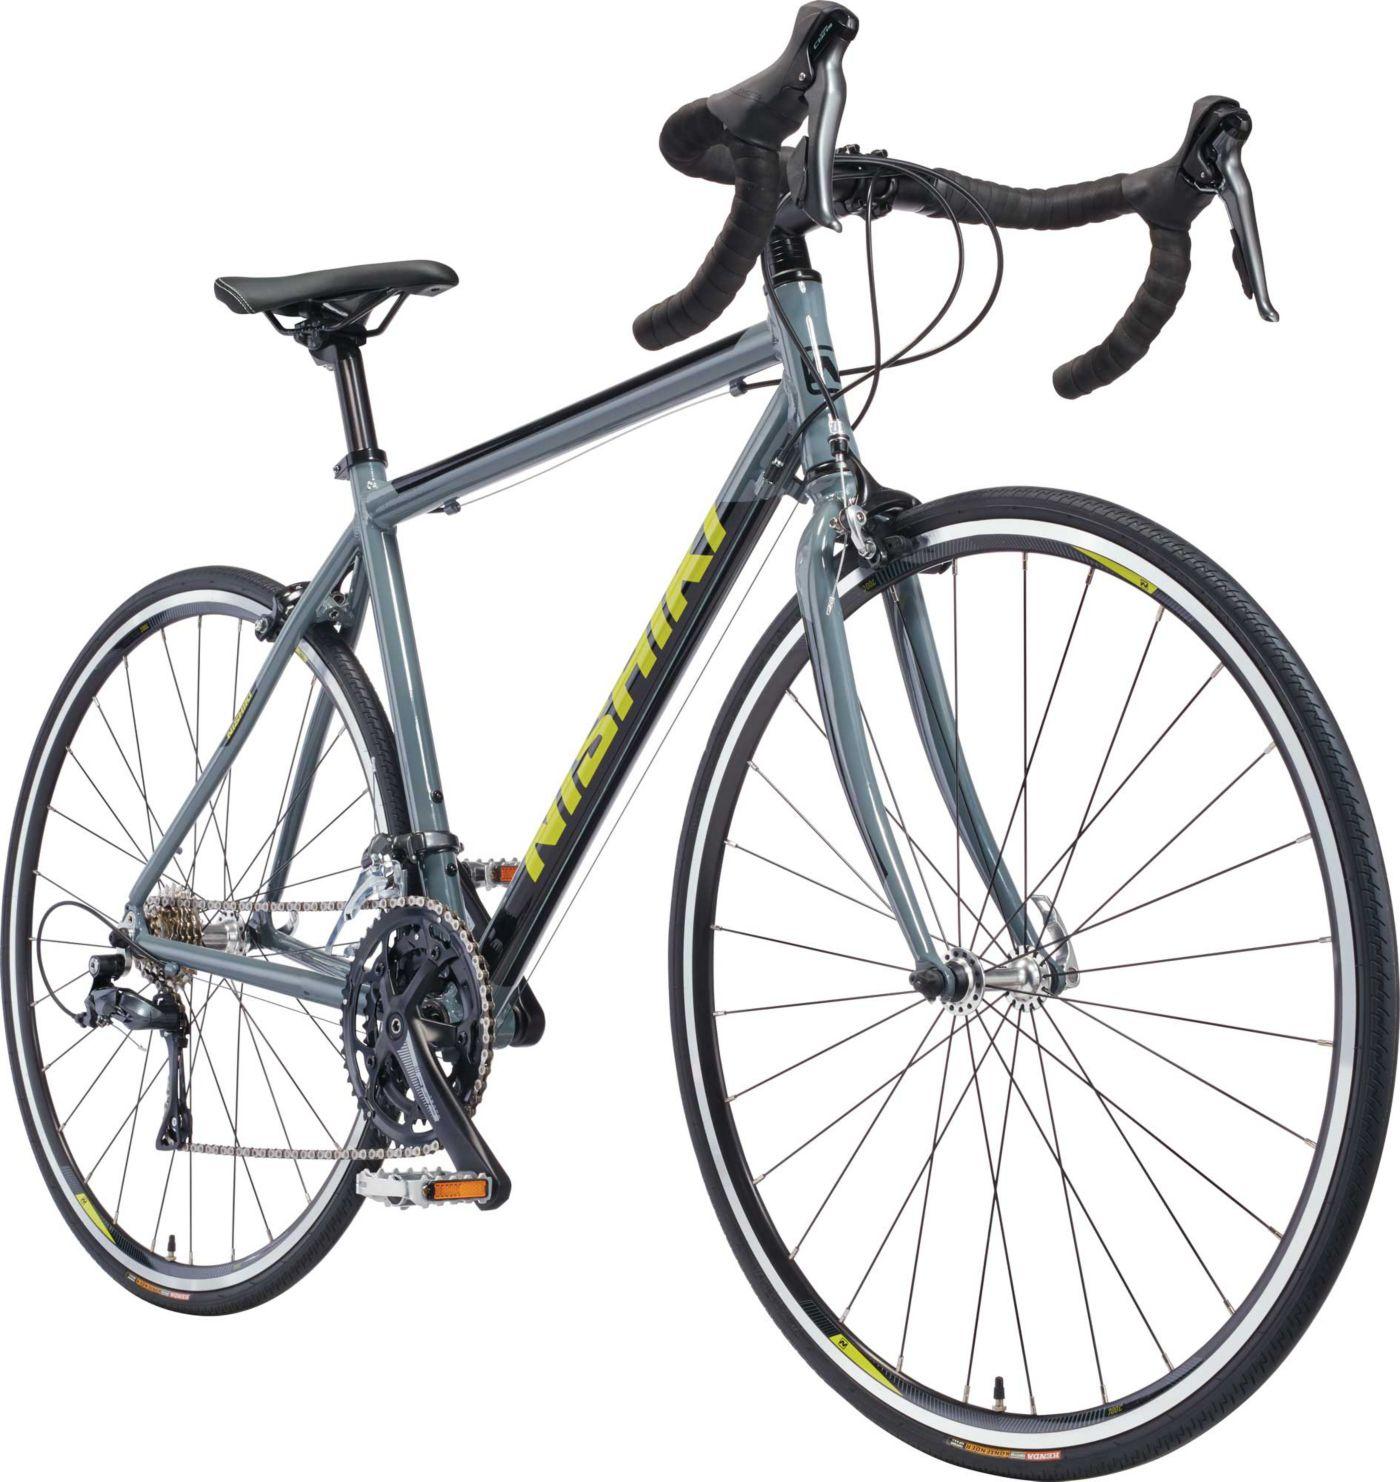 Nishiki Men S Maricopa Road Bike 419 98 Slickdeals Net